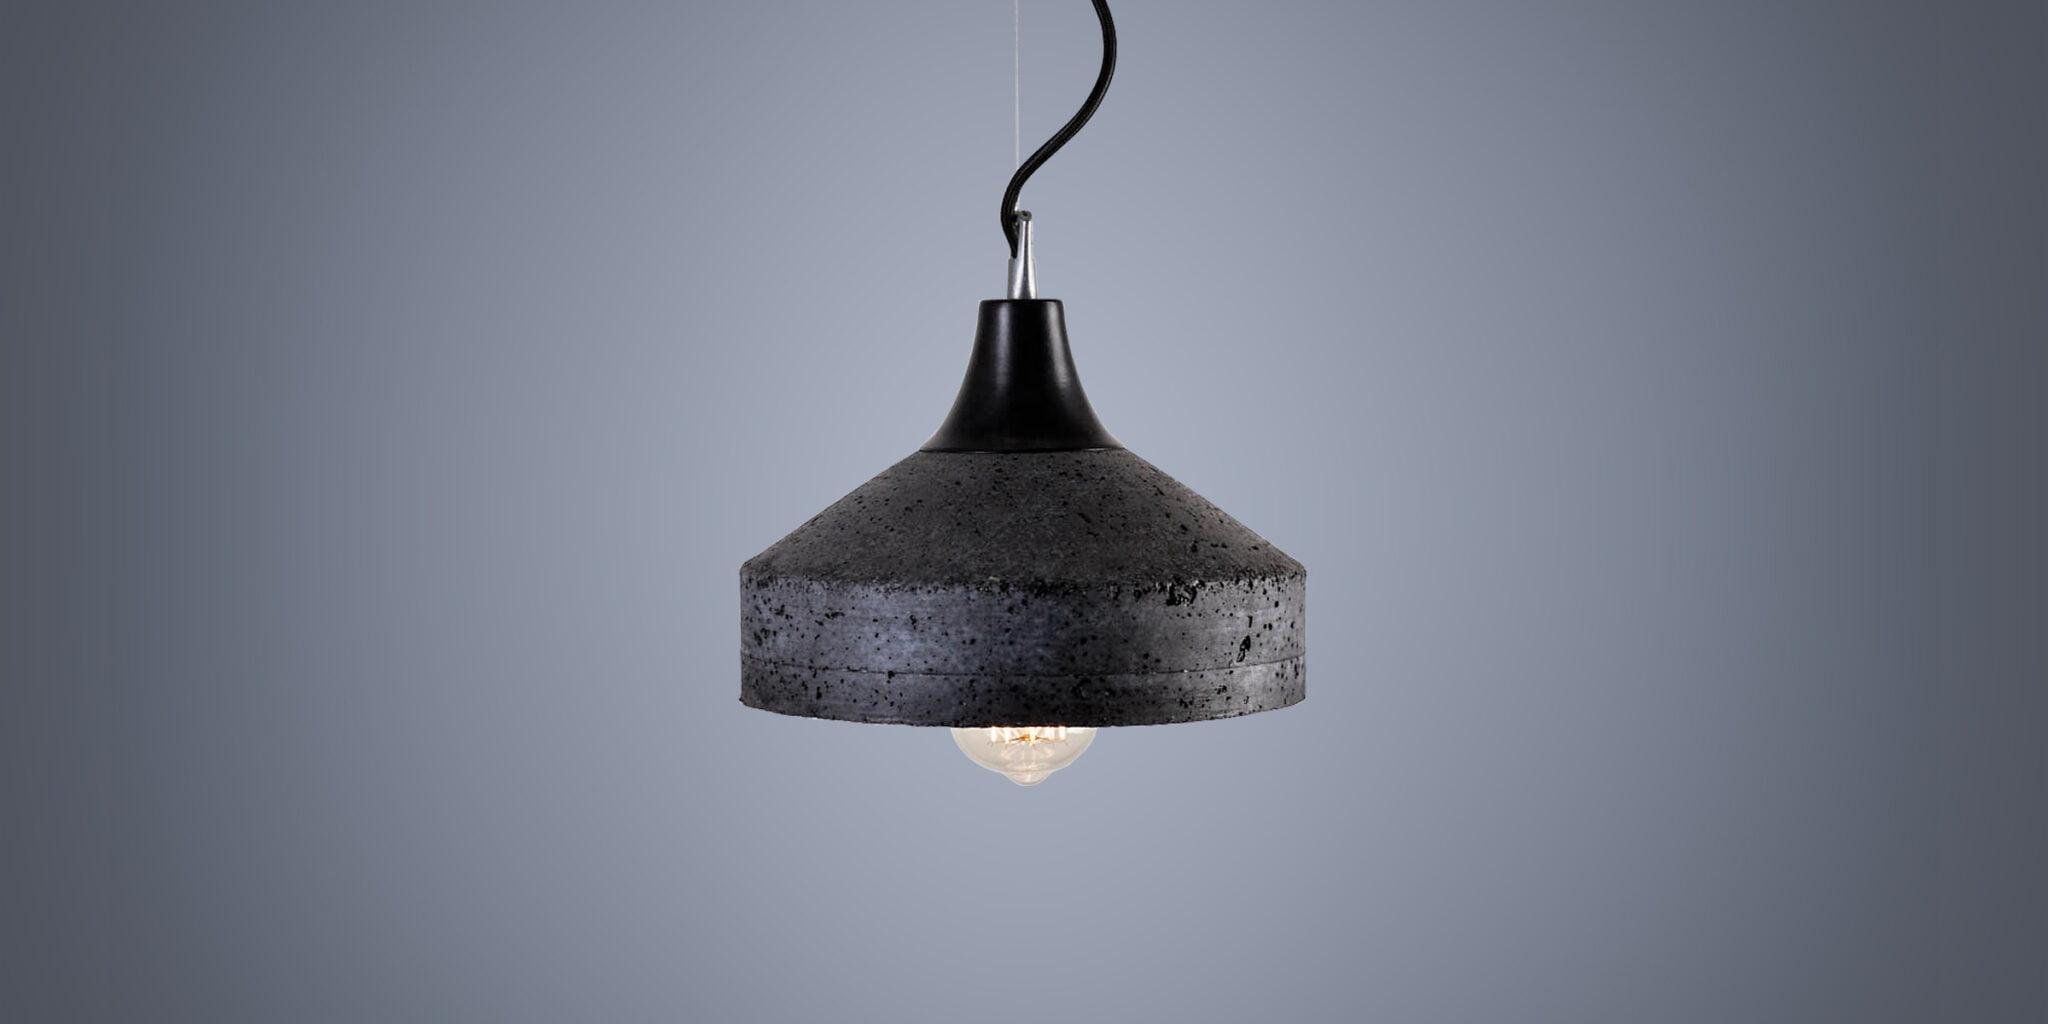 lampy industrialne metalowe sufitowe jak wieża eifla